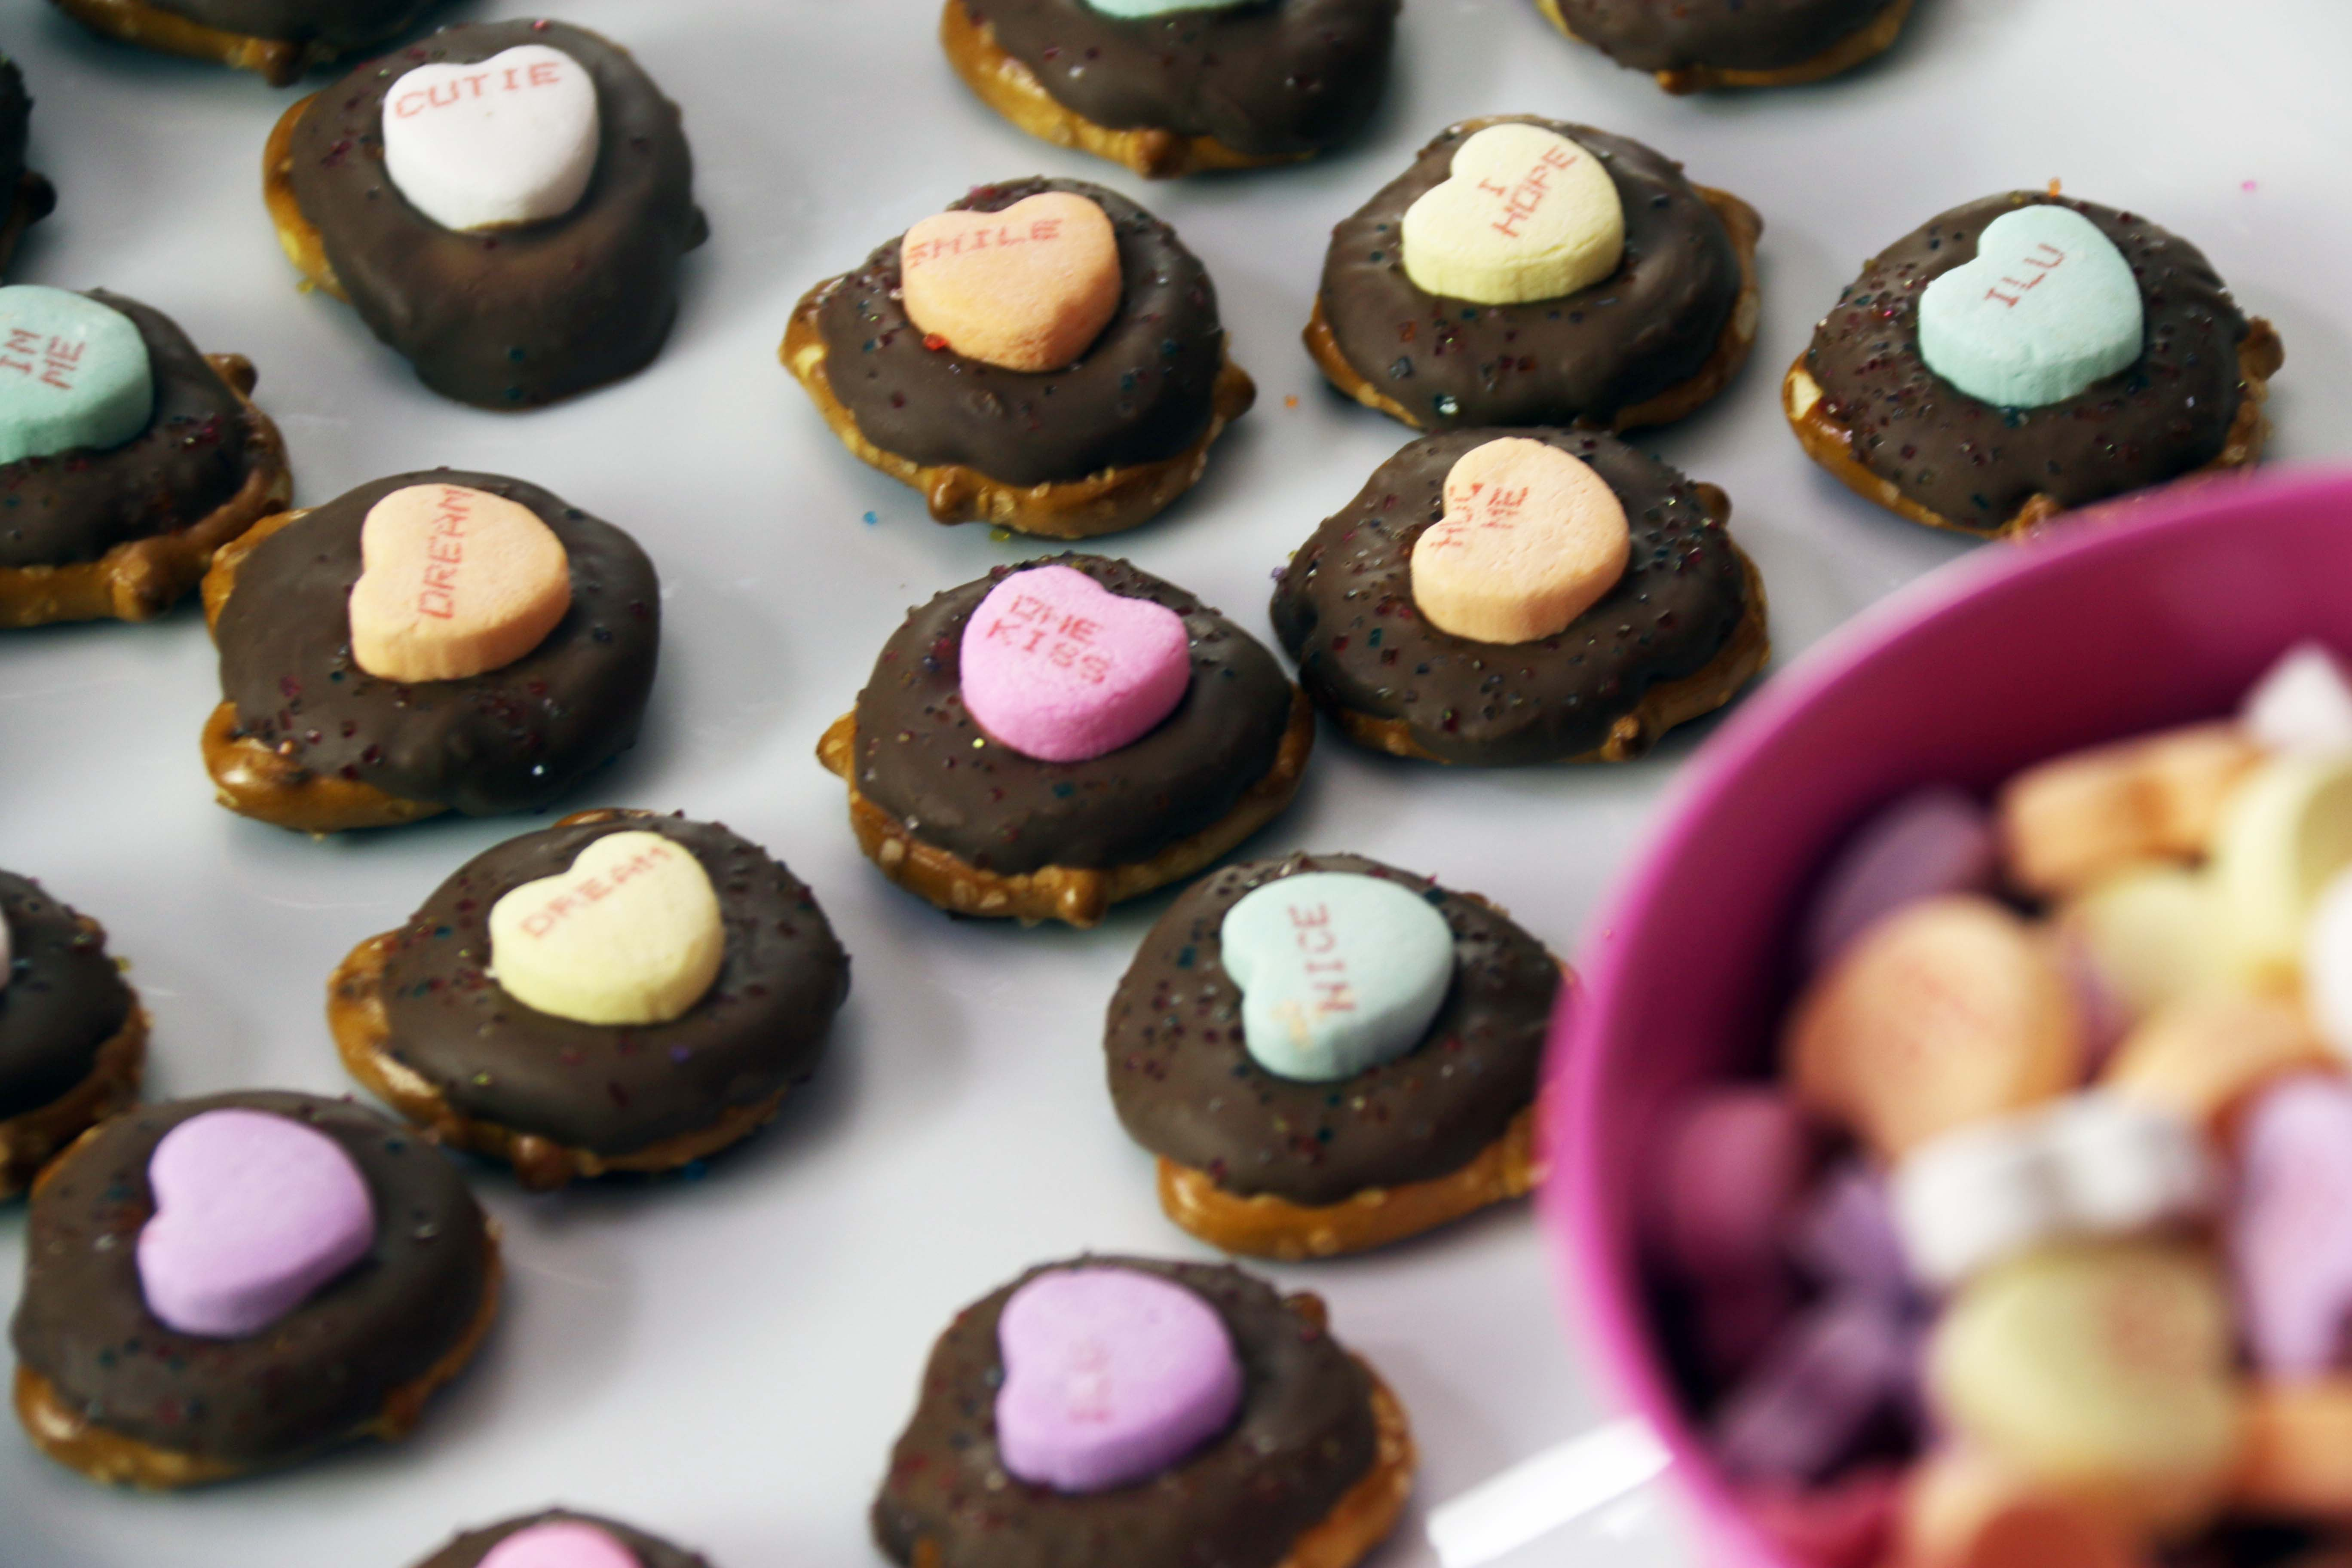 How to Make an Easy & Yummy Valentine's Pretzel Treat